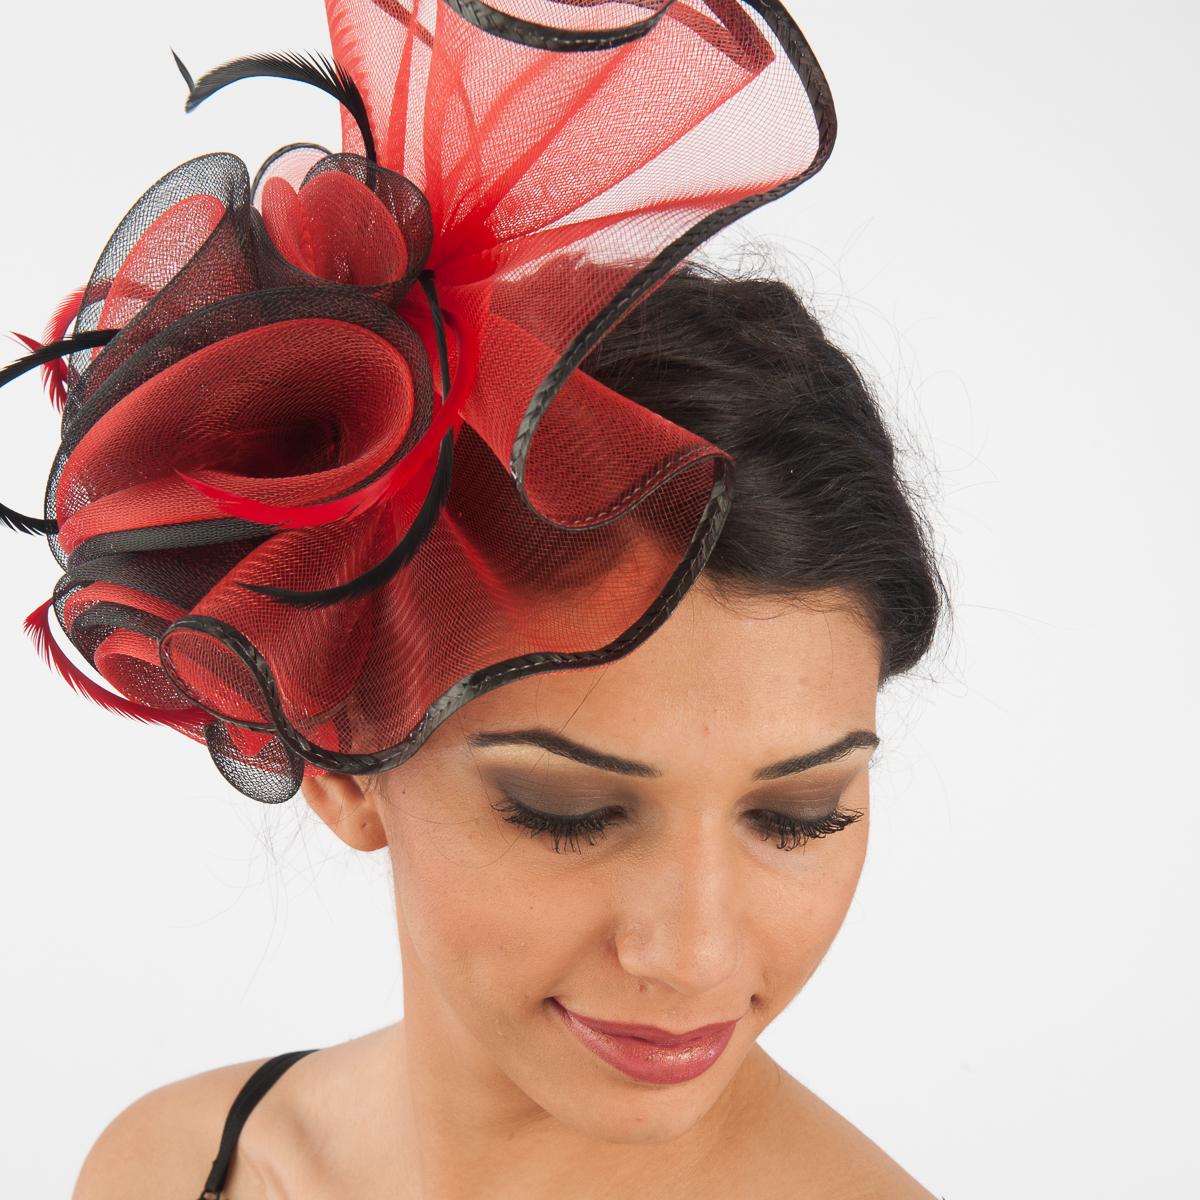 105f4053bfa Red-Black Crinoline Comb Fascinator Cocktail Hats-5757C-RD.BK- Sun ...